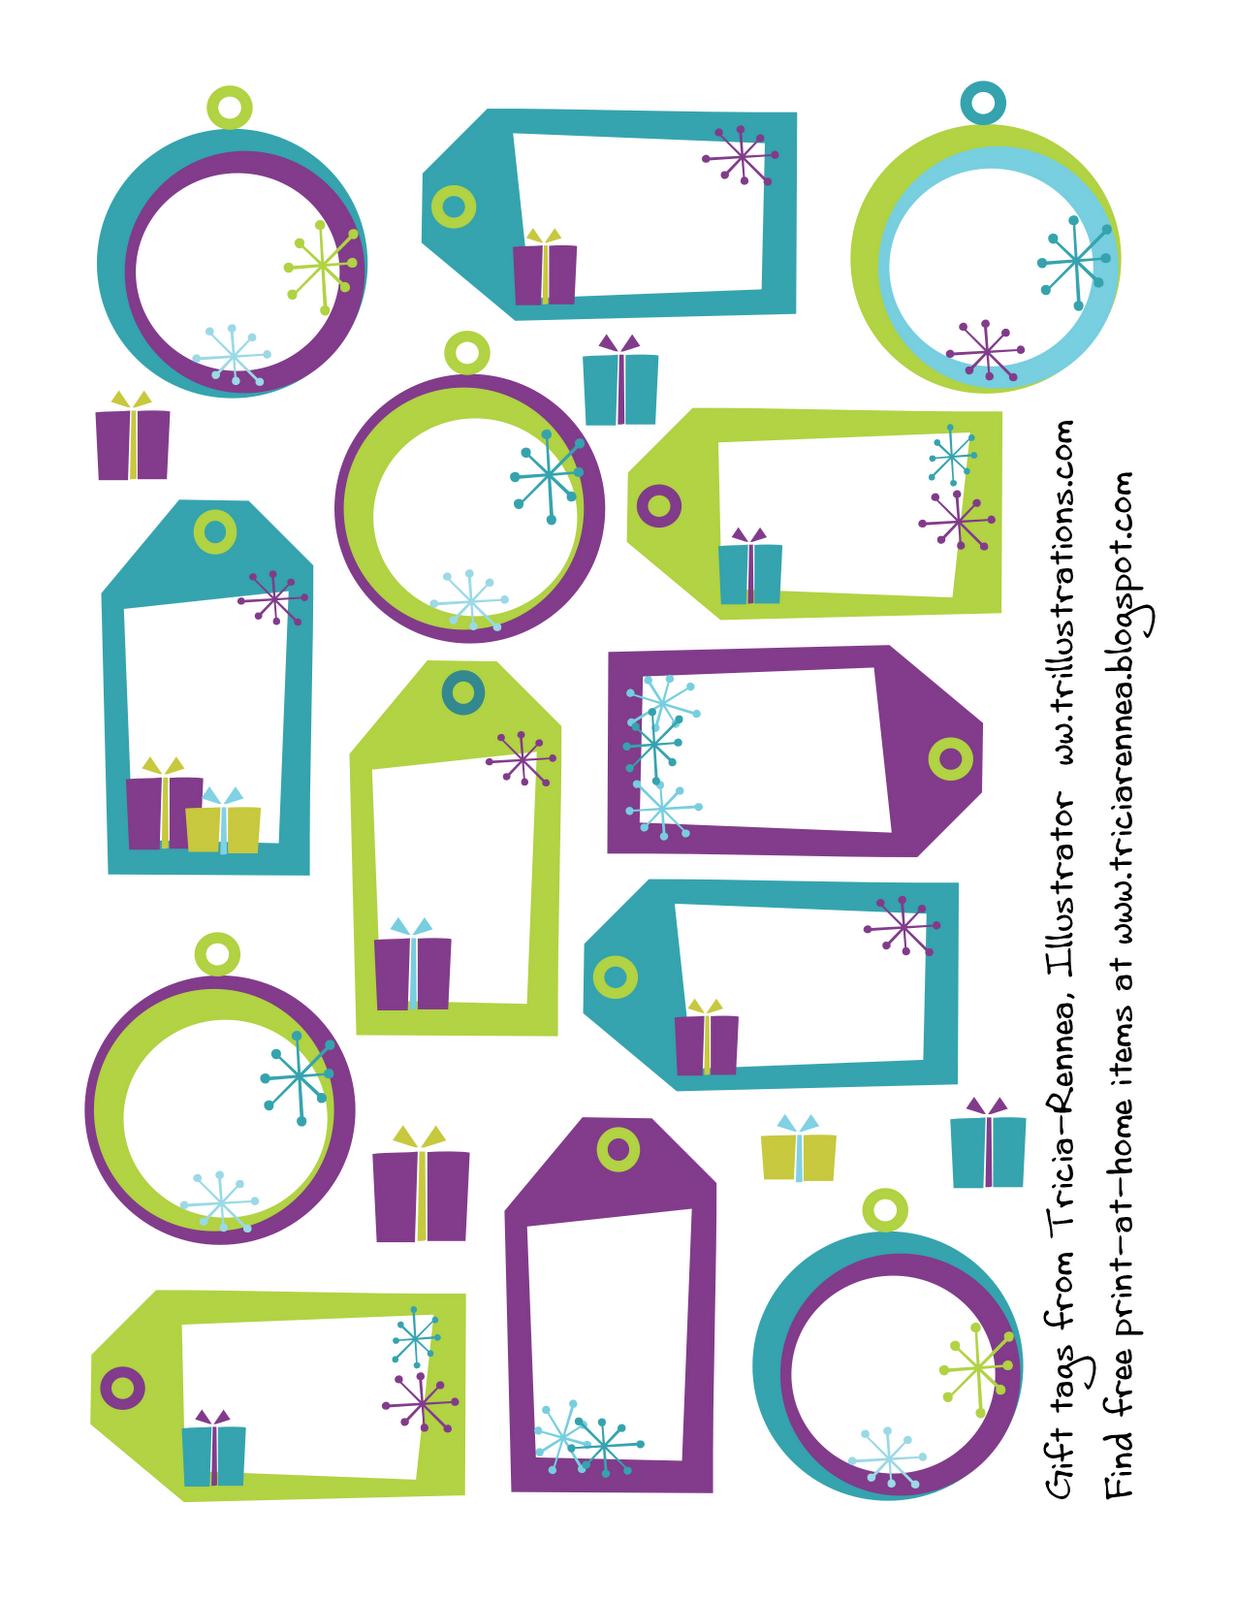 Etiquetas de navidad gratis | Imprimibles gratis | Pinterest ...